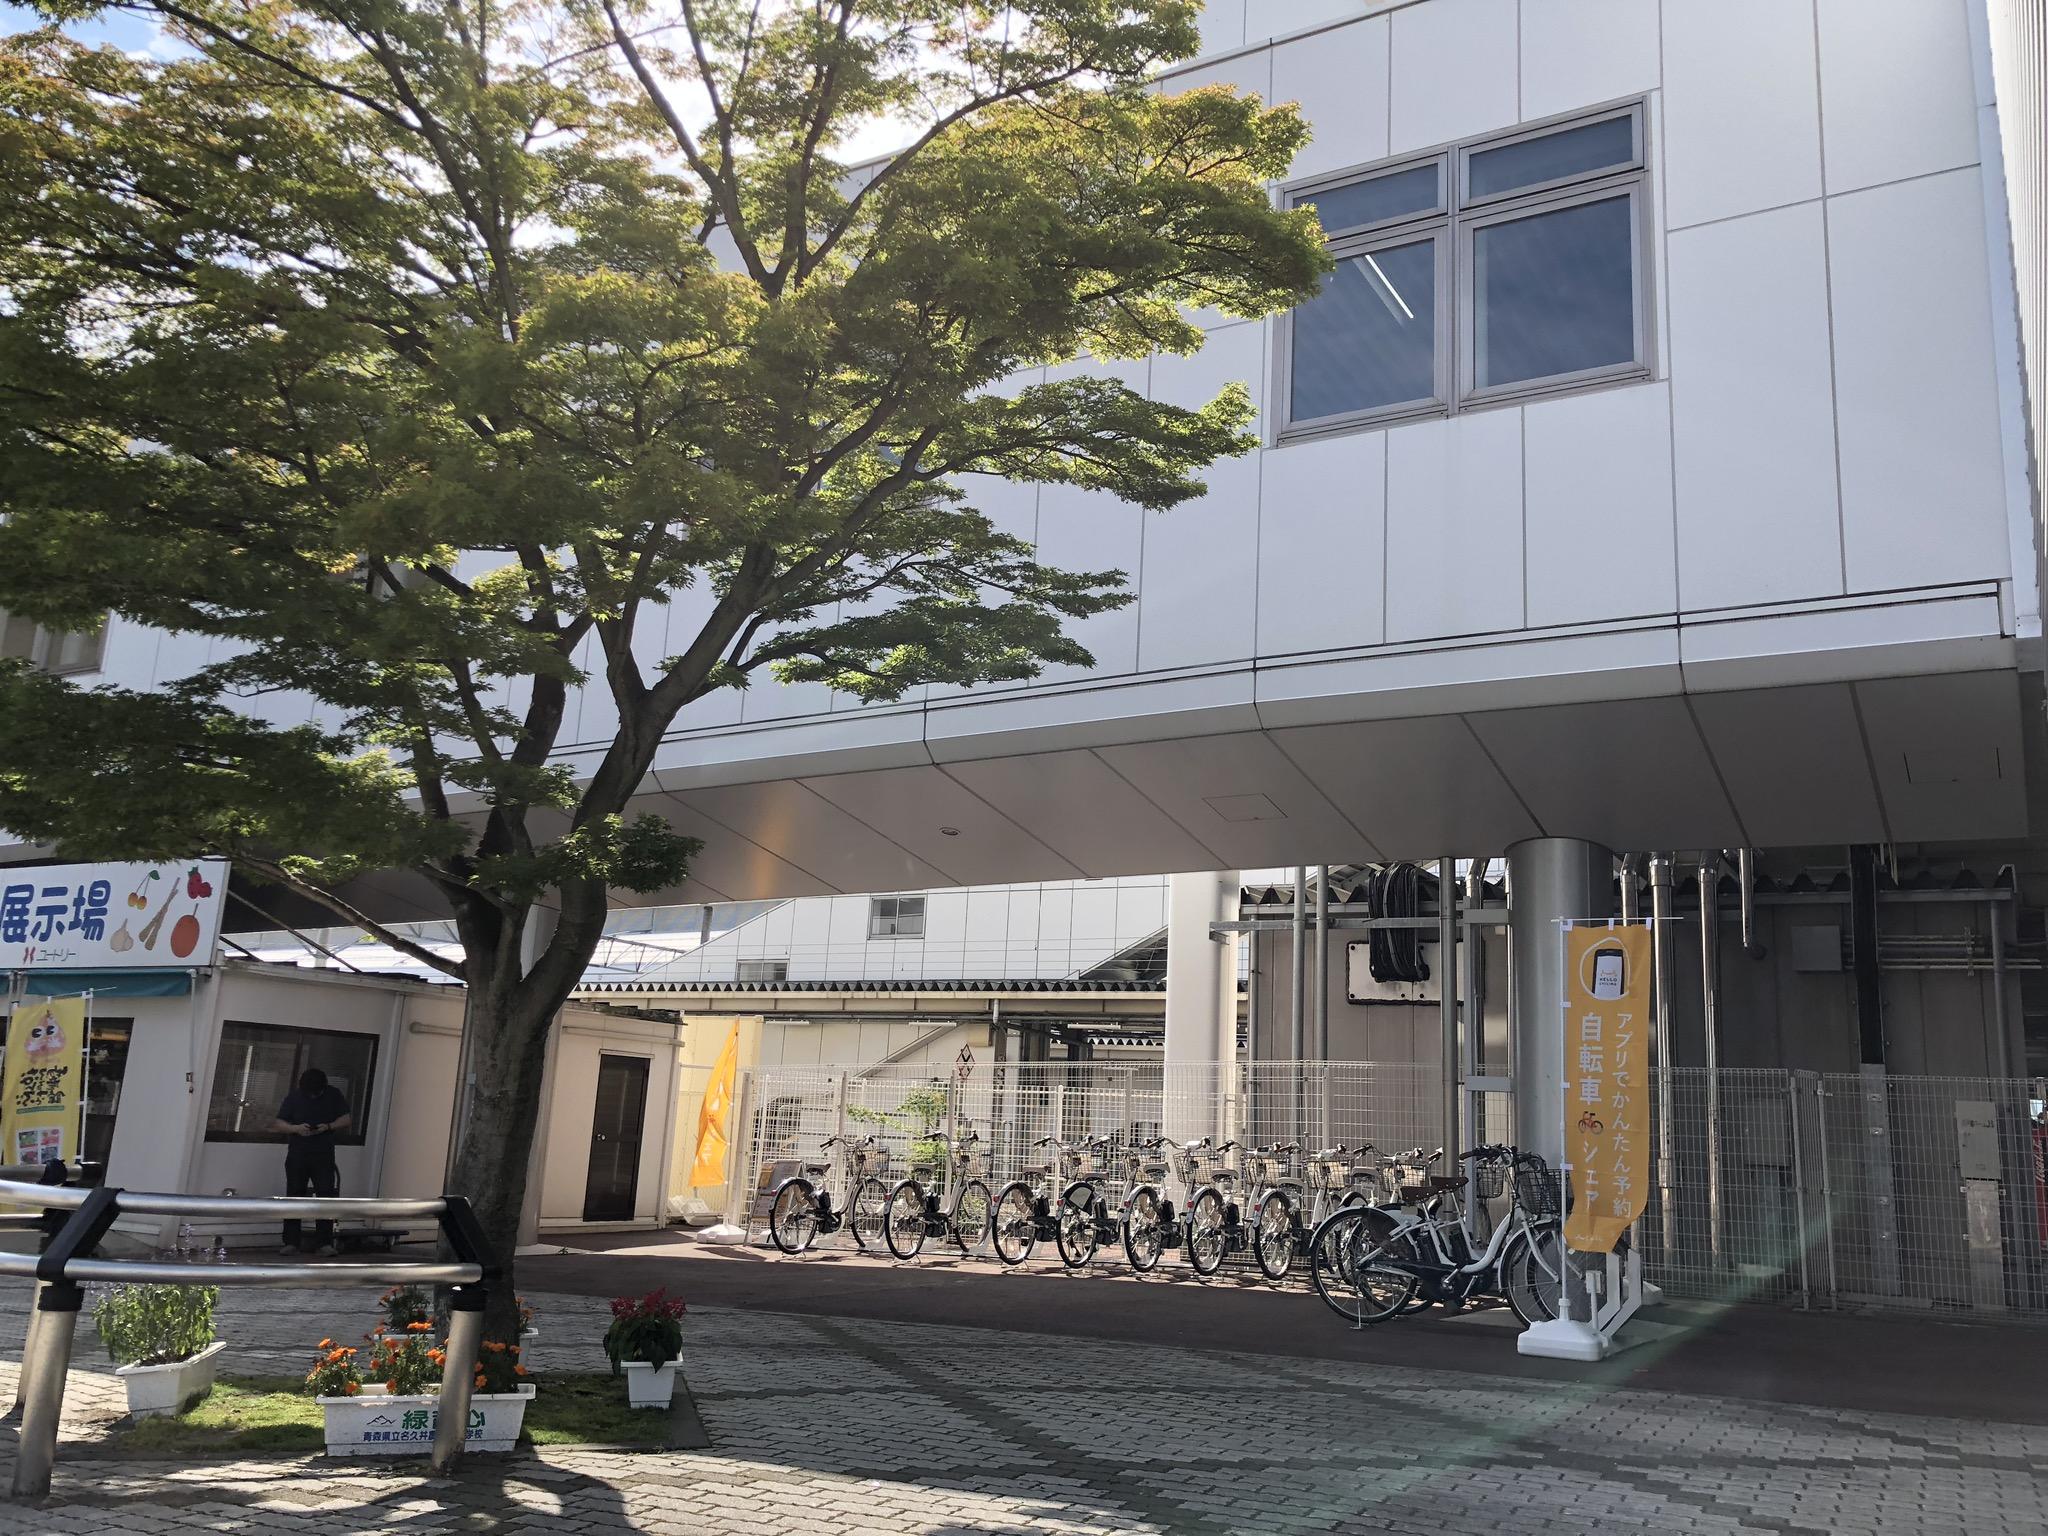 JR八戸駅東口バス停前広場 (HELLO CYCLING ポート) image